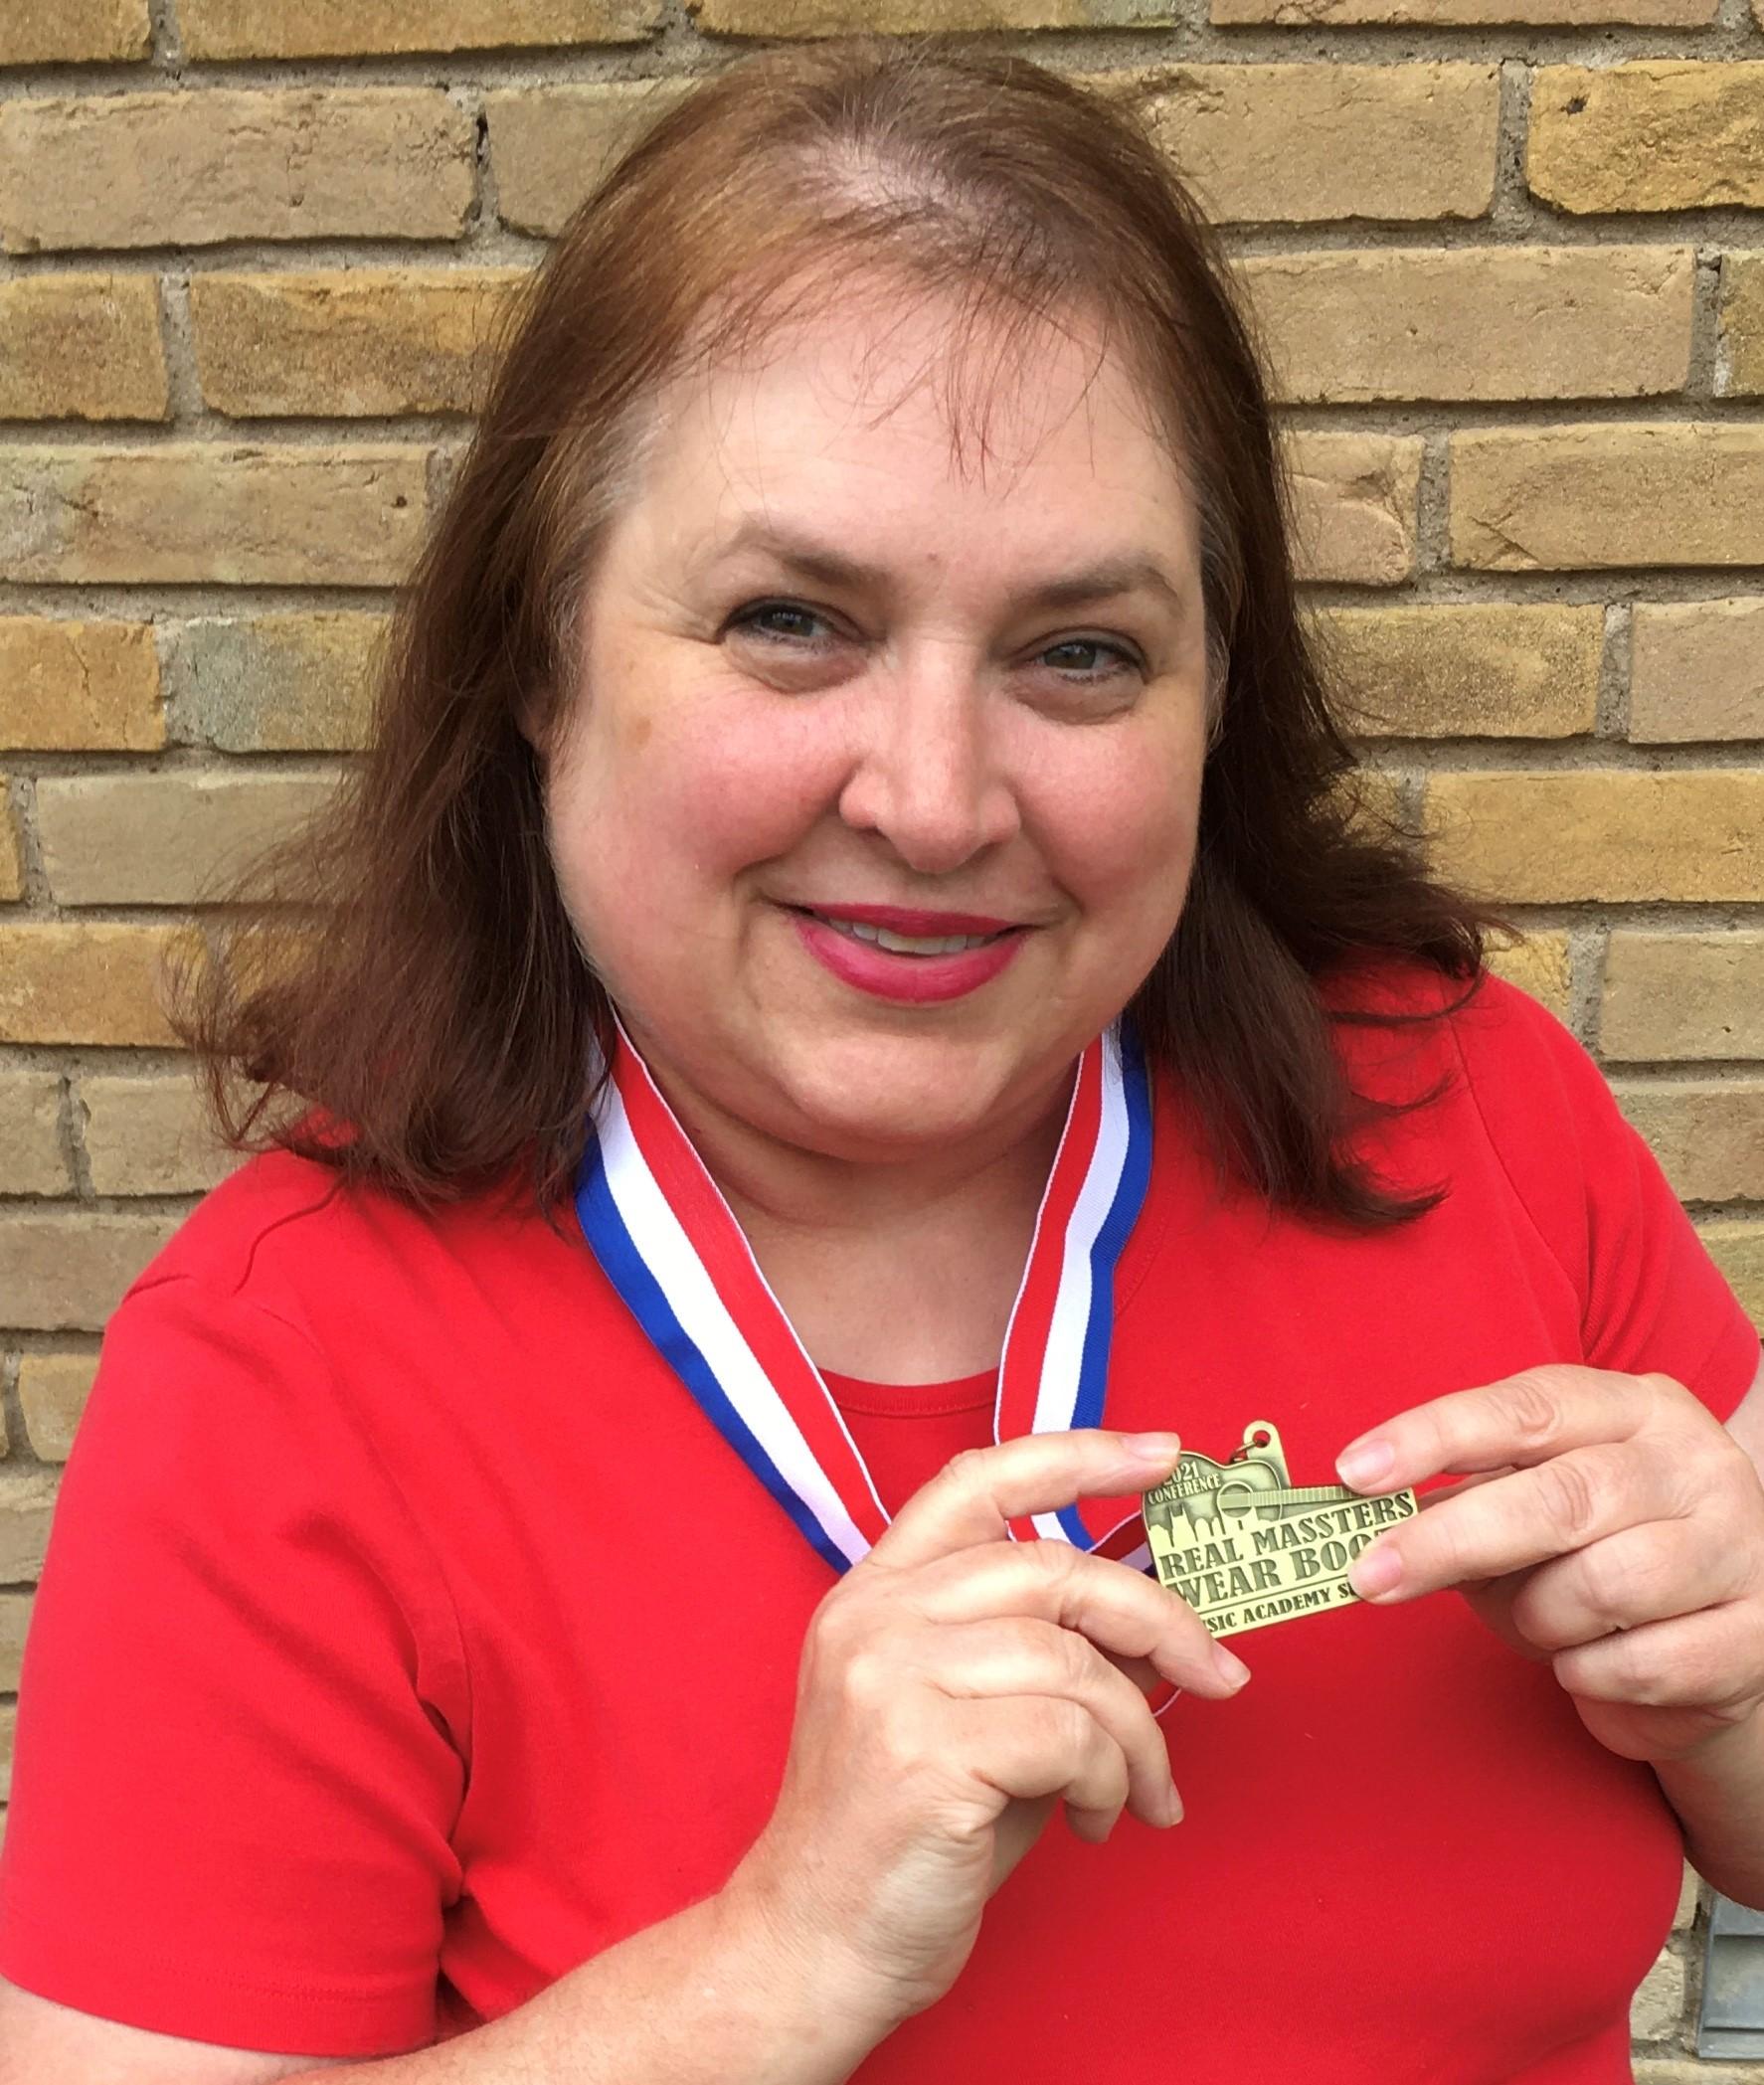 Award won by Dallas Piano Academy